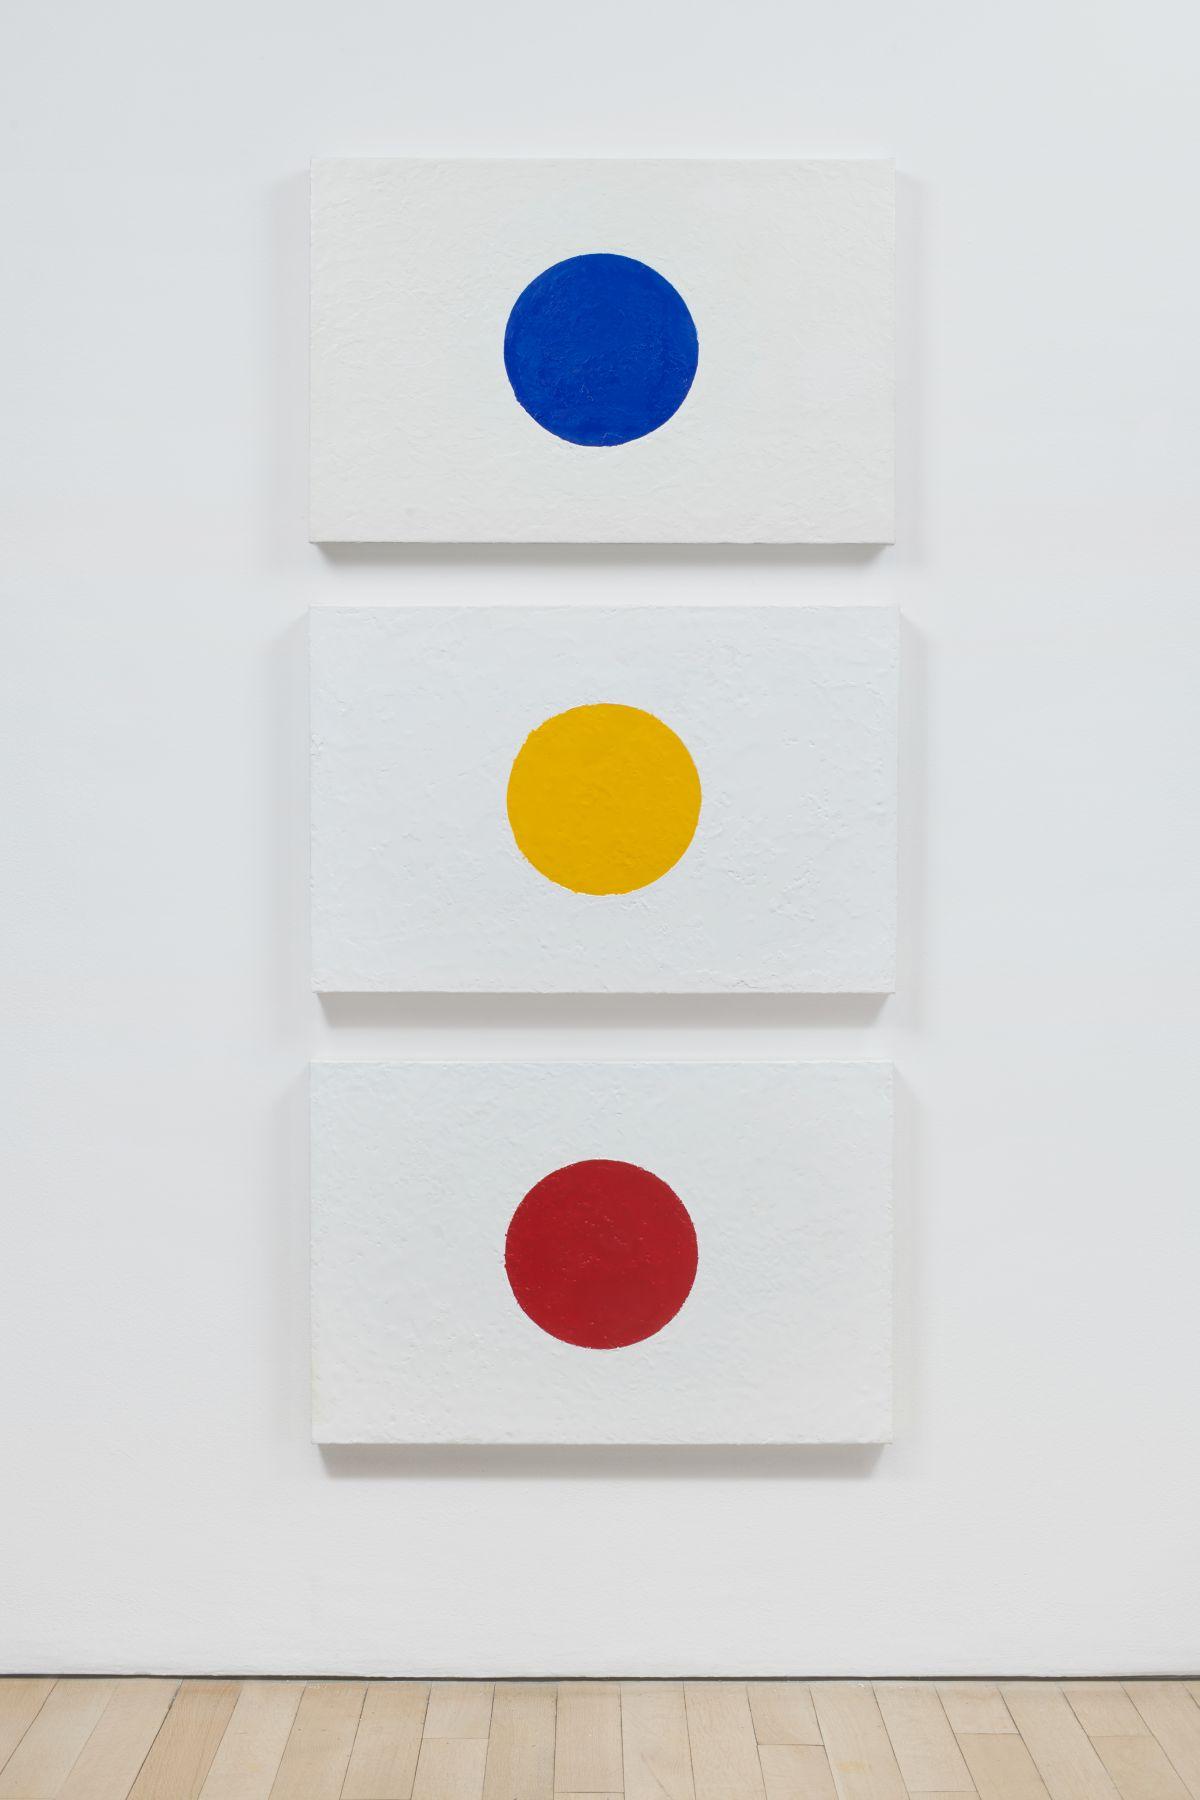 BYRON KIM 누가 빨강, 노랑, 파랑을 무서워하는가? (Who's Afraid of Red, Yellow and Blue?)